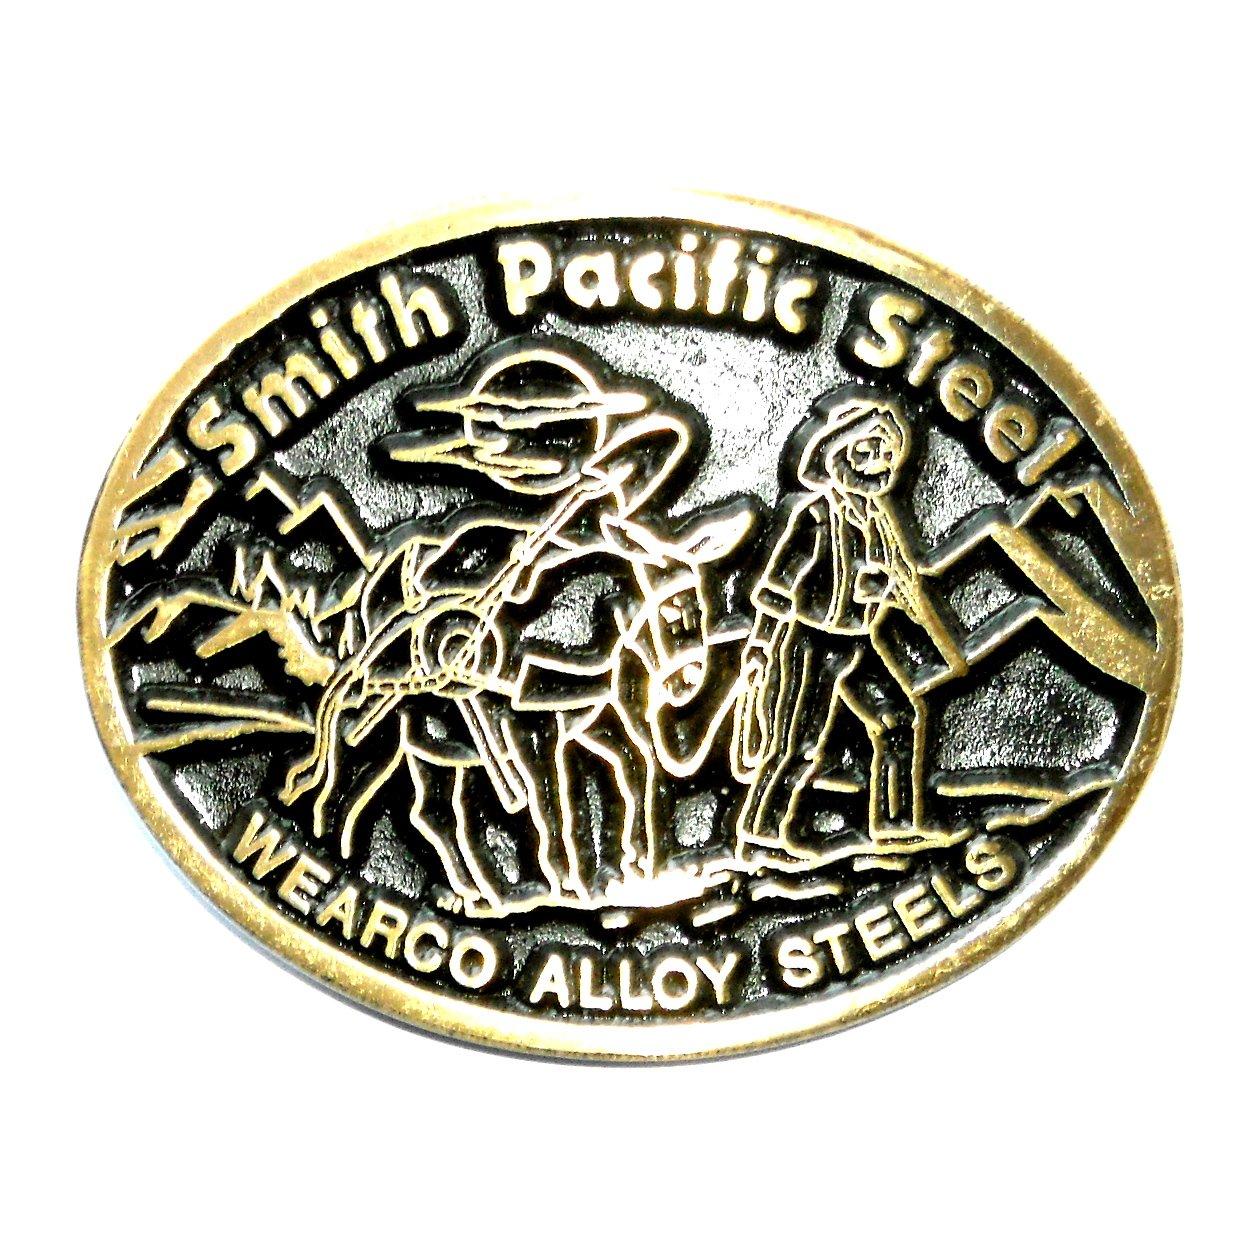 Smith Pacific Steel Dyna Brass Vintage Belt Buckle